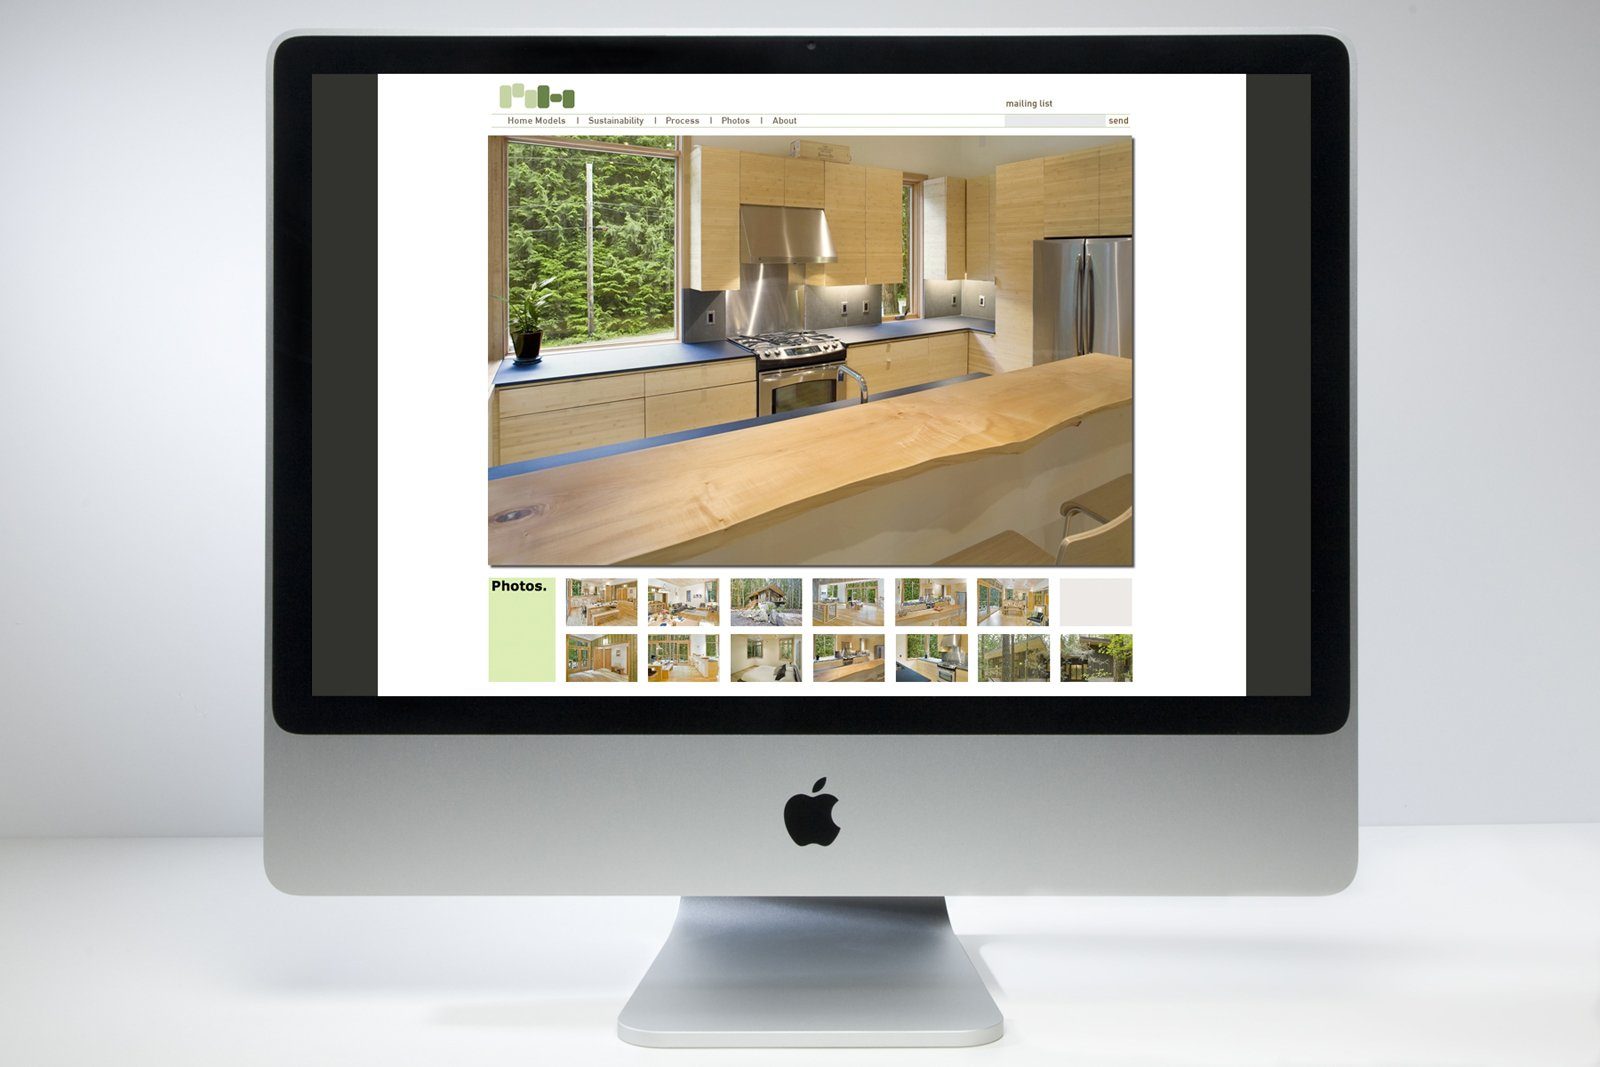 "Method Homes website design by Autograph  Search ""서초출장마사지-출장안마-출장-출장서비스 서초콜걸 출장샵 { ㅋr톡bc288 }  주소{ ☻sannhu,com }  서초 출장여대생 만남 출장만남 업소 타이마사지 출장샵추천 업소  서초출장샵 출장서비스 출장업소"" from Q&A with Autograph Creative Directors"